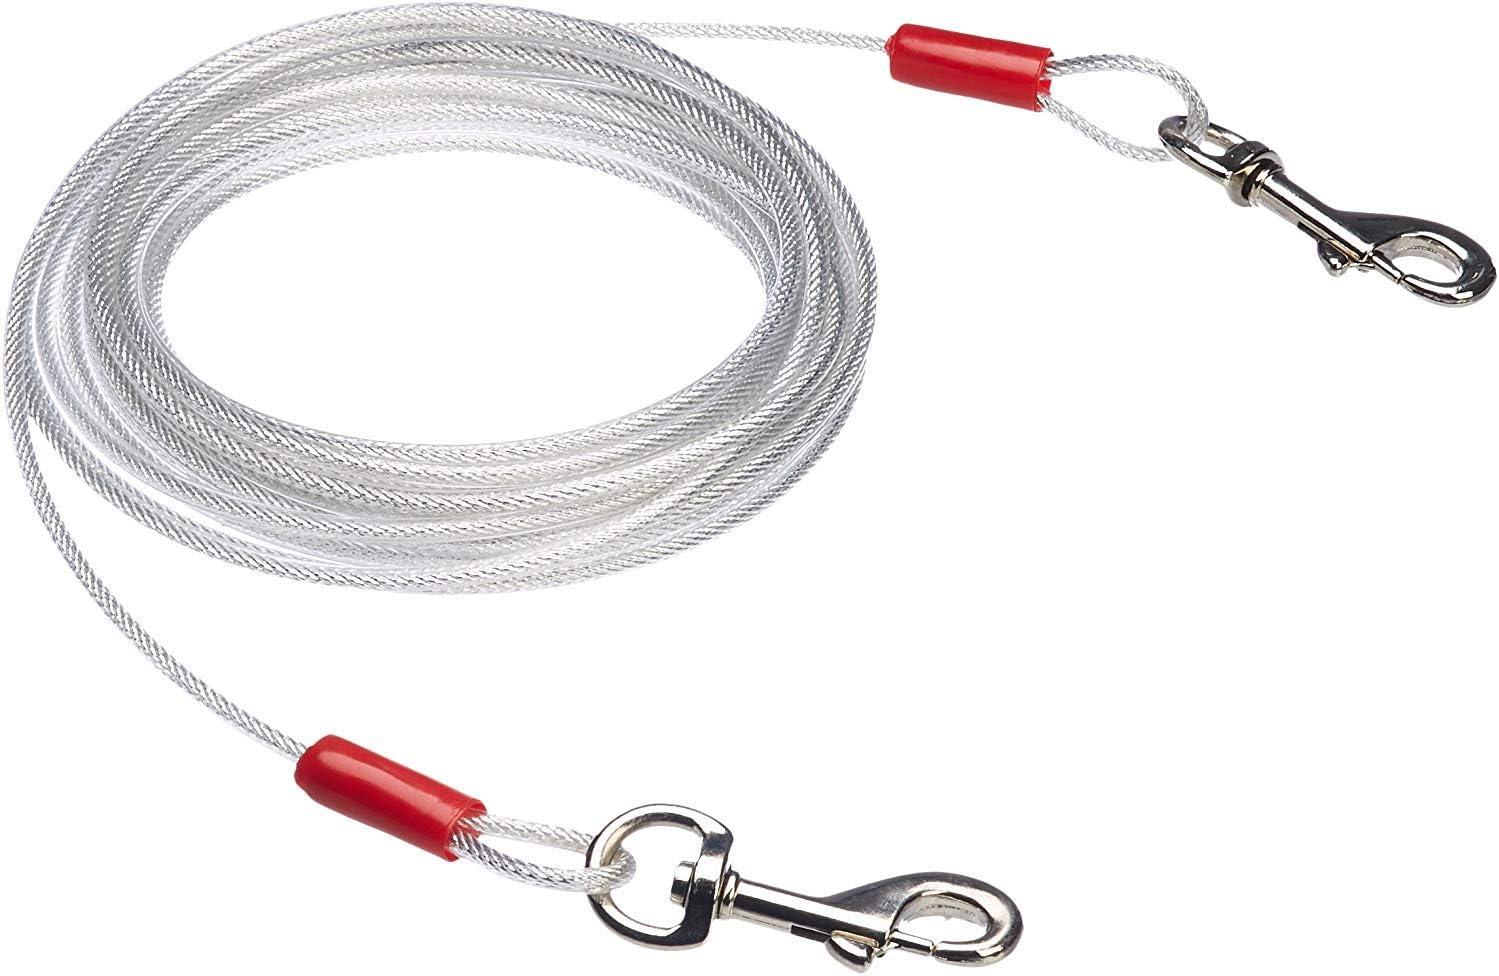 Amazon Basics 2590, Cable para Atar Perros (Hasta 40kg, 7,62m), Blanco